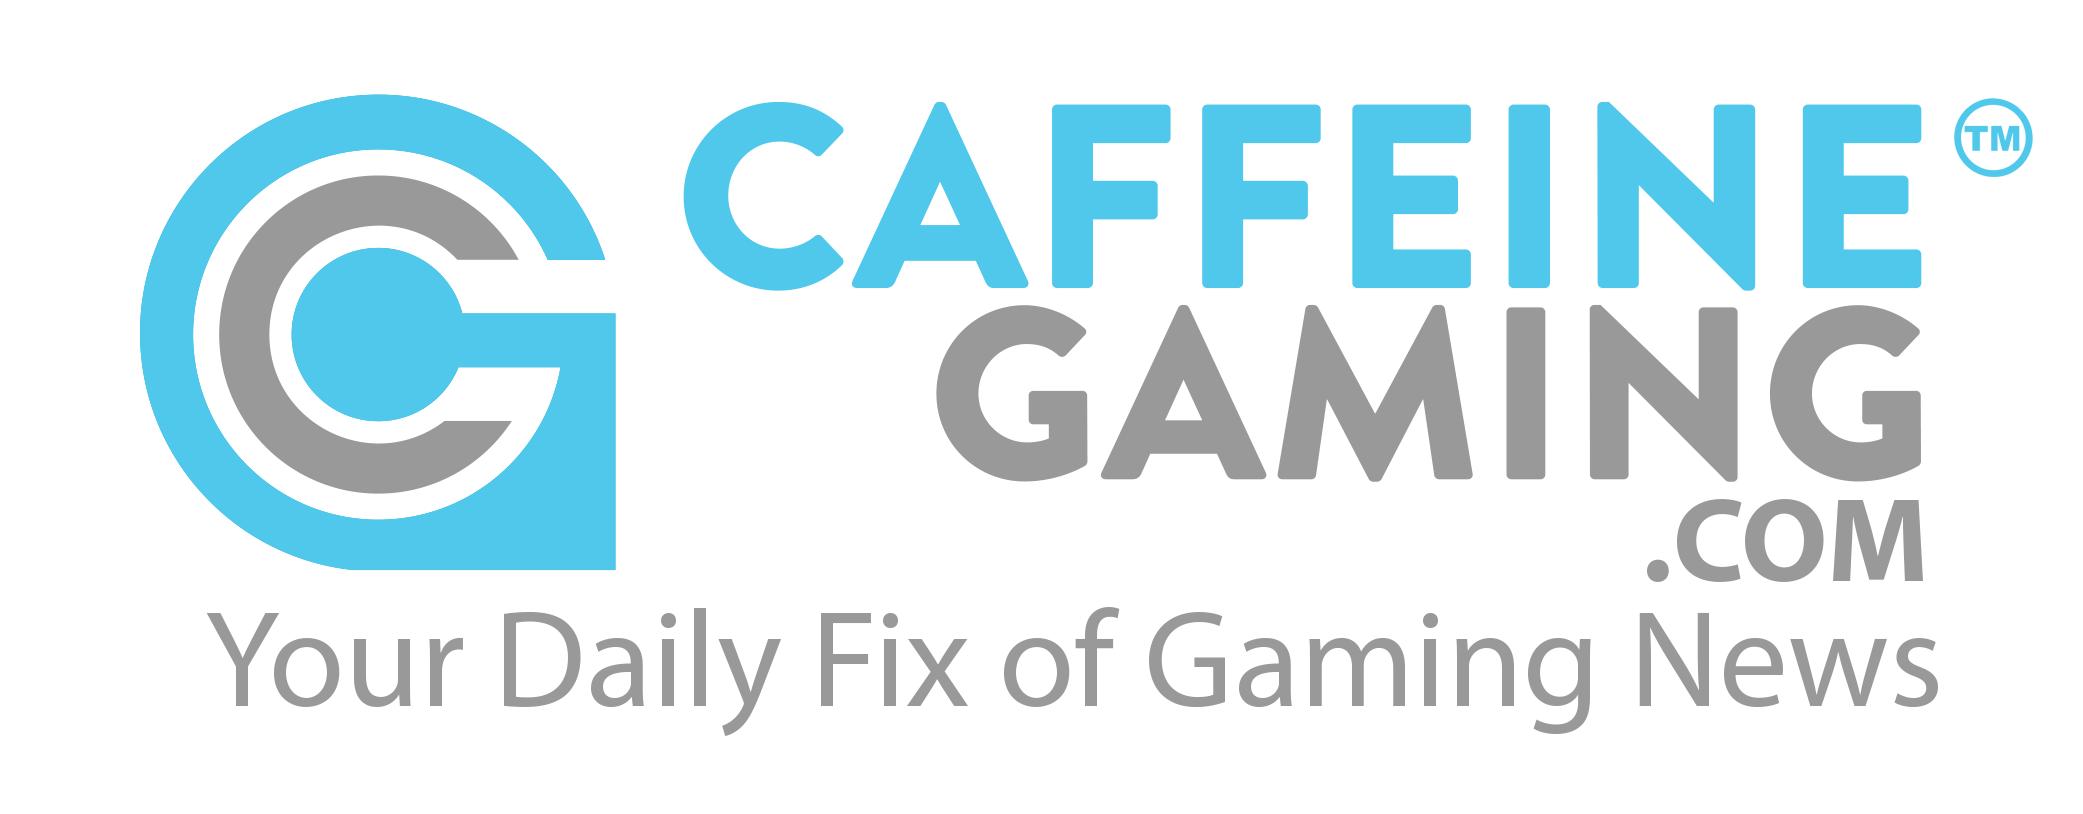 Caffeine Gaming